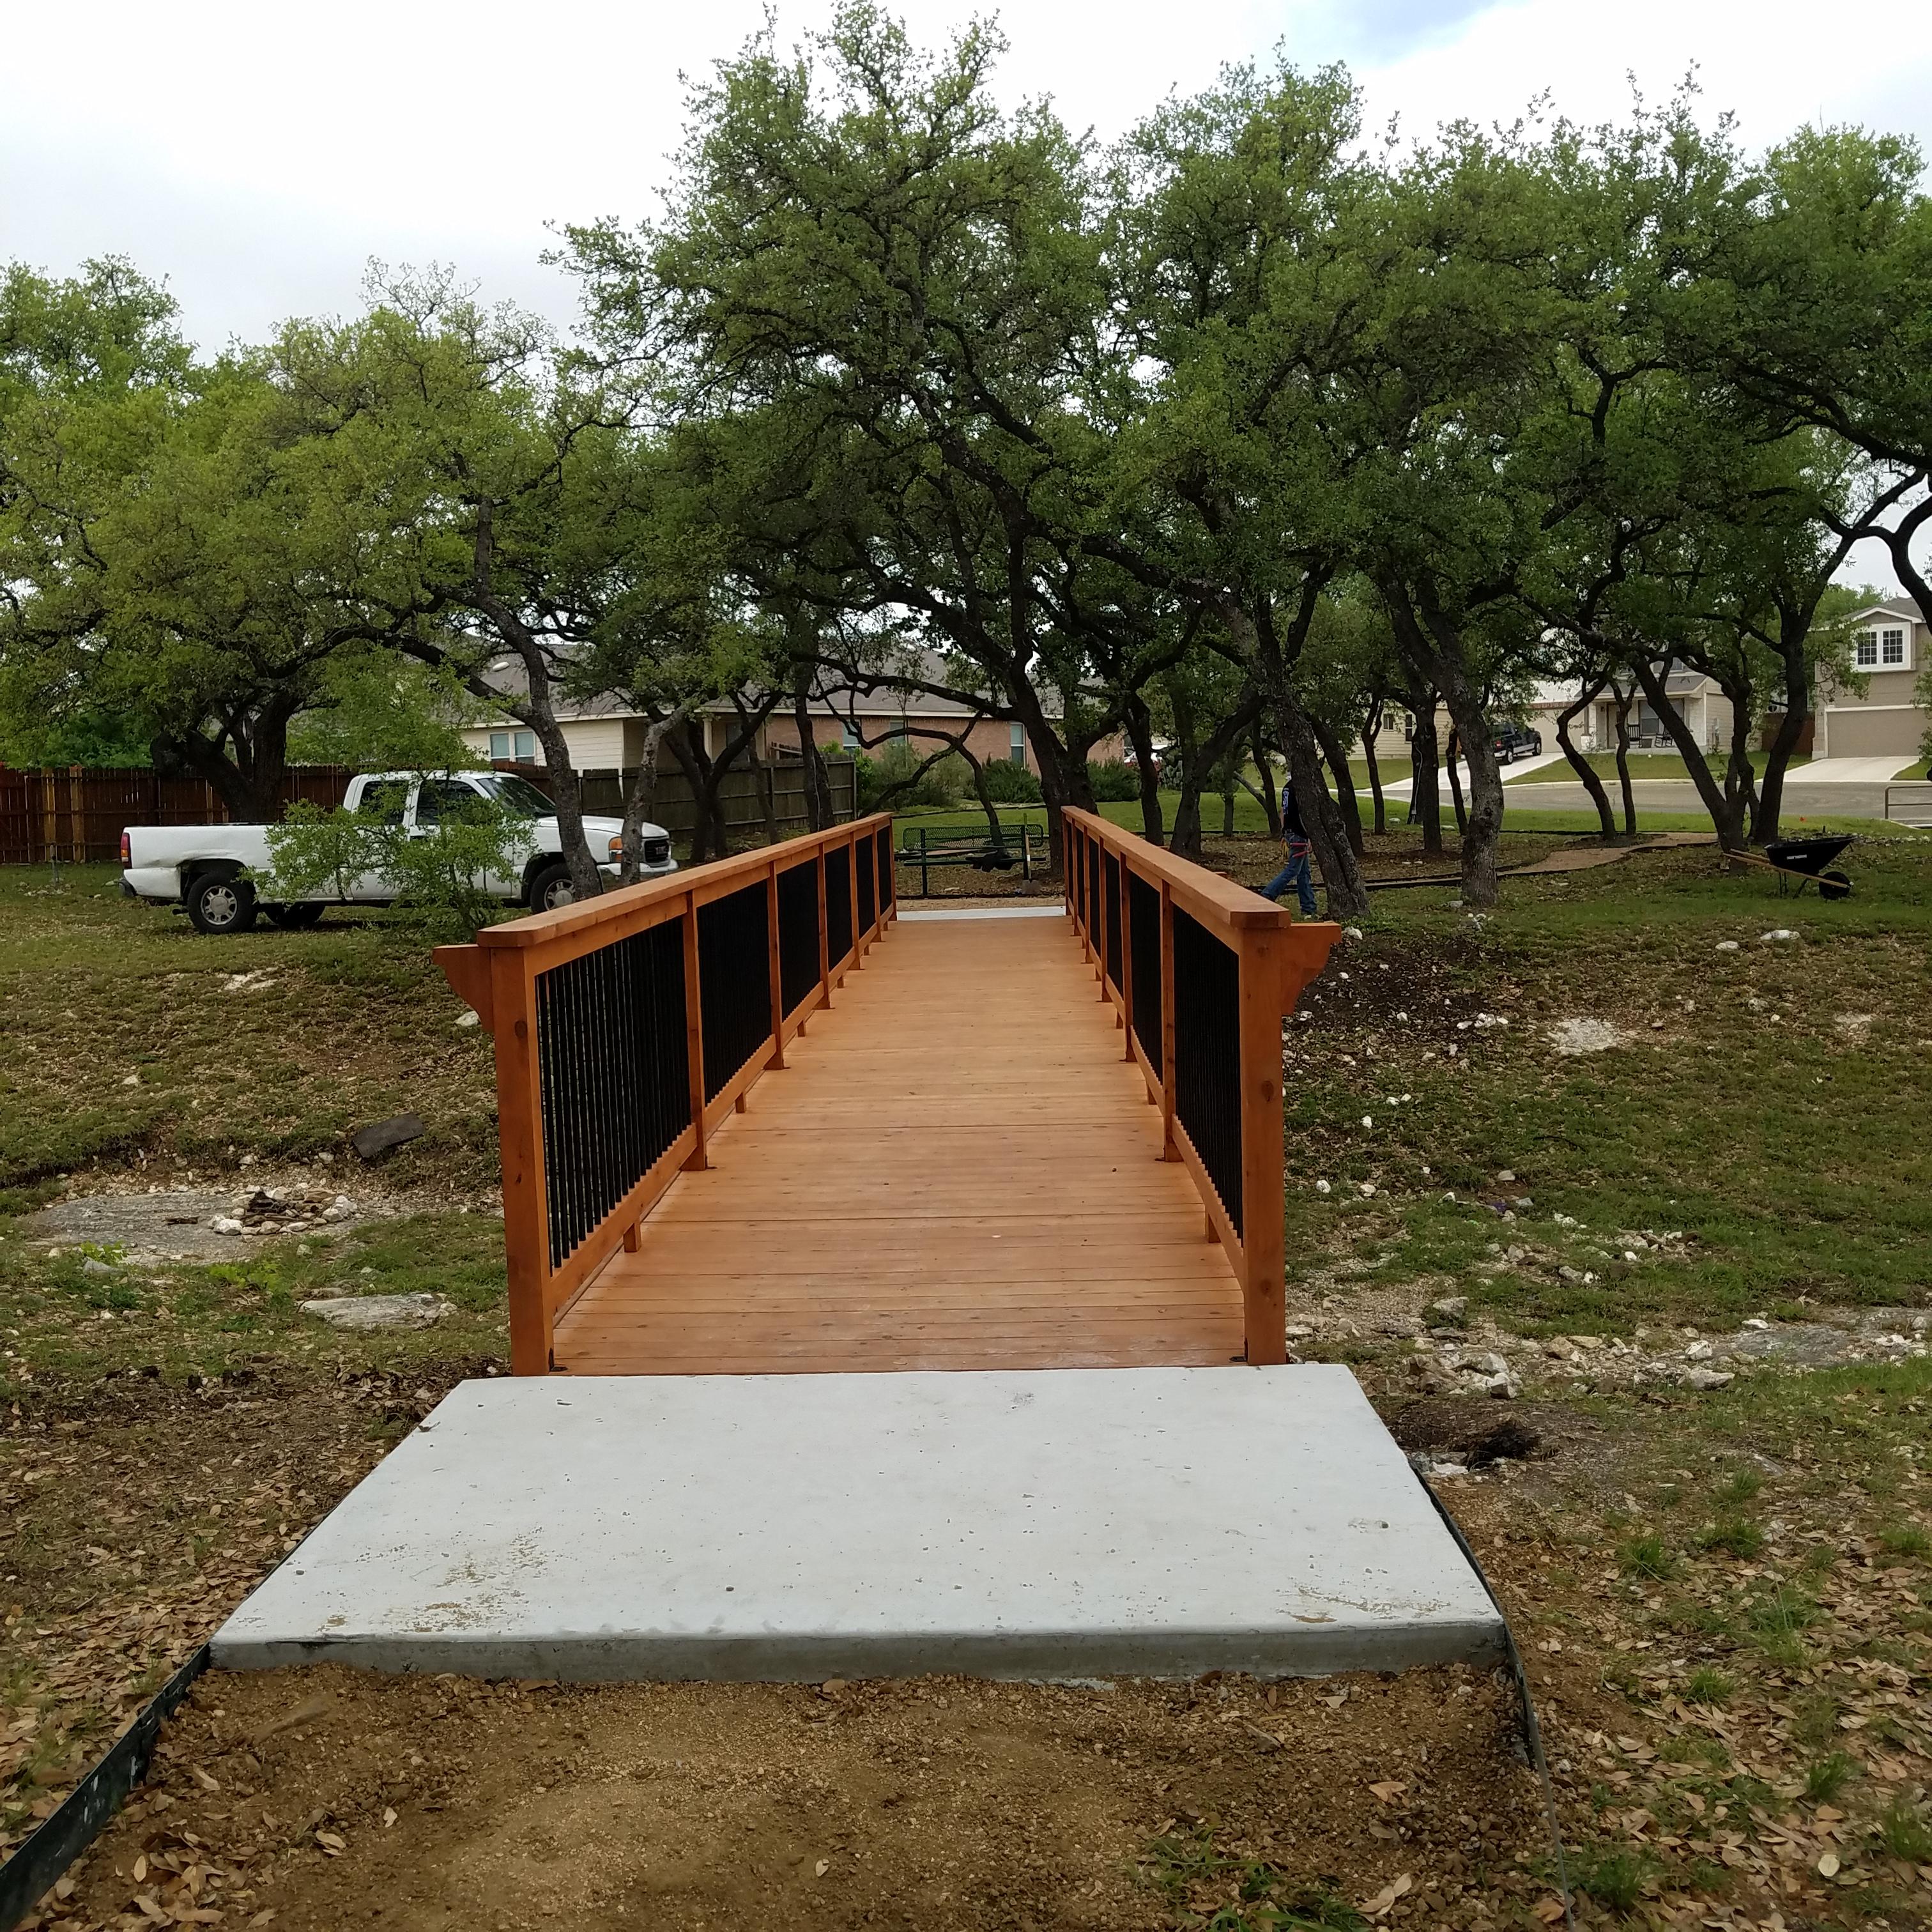 Pedestrian Walk Bridge - Right Source Roofing & Construction